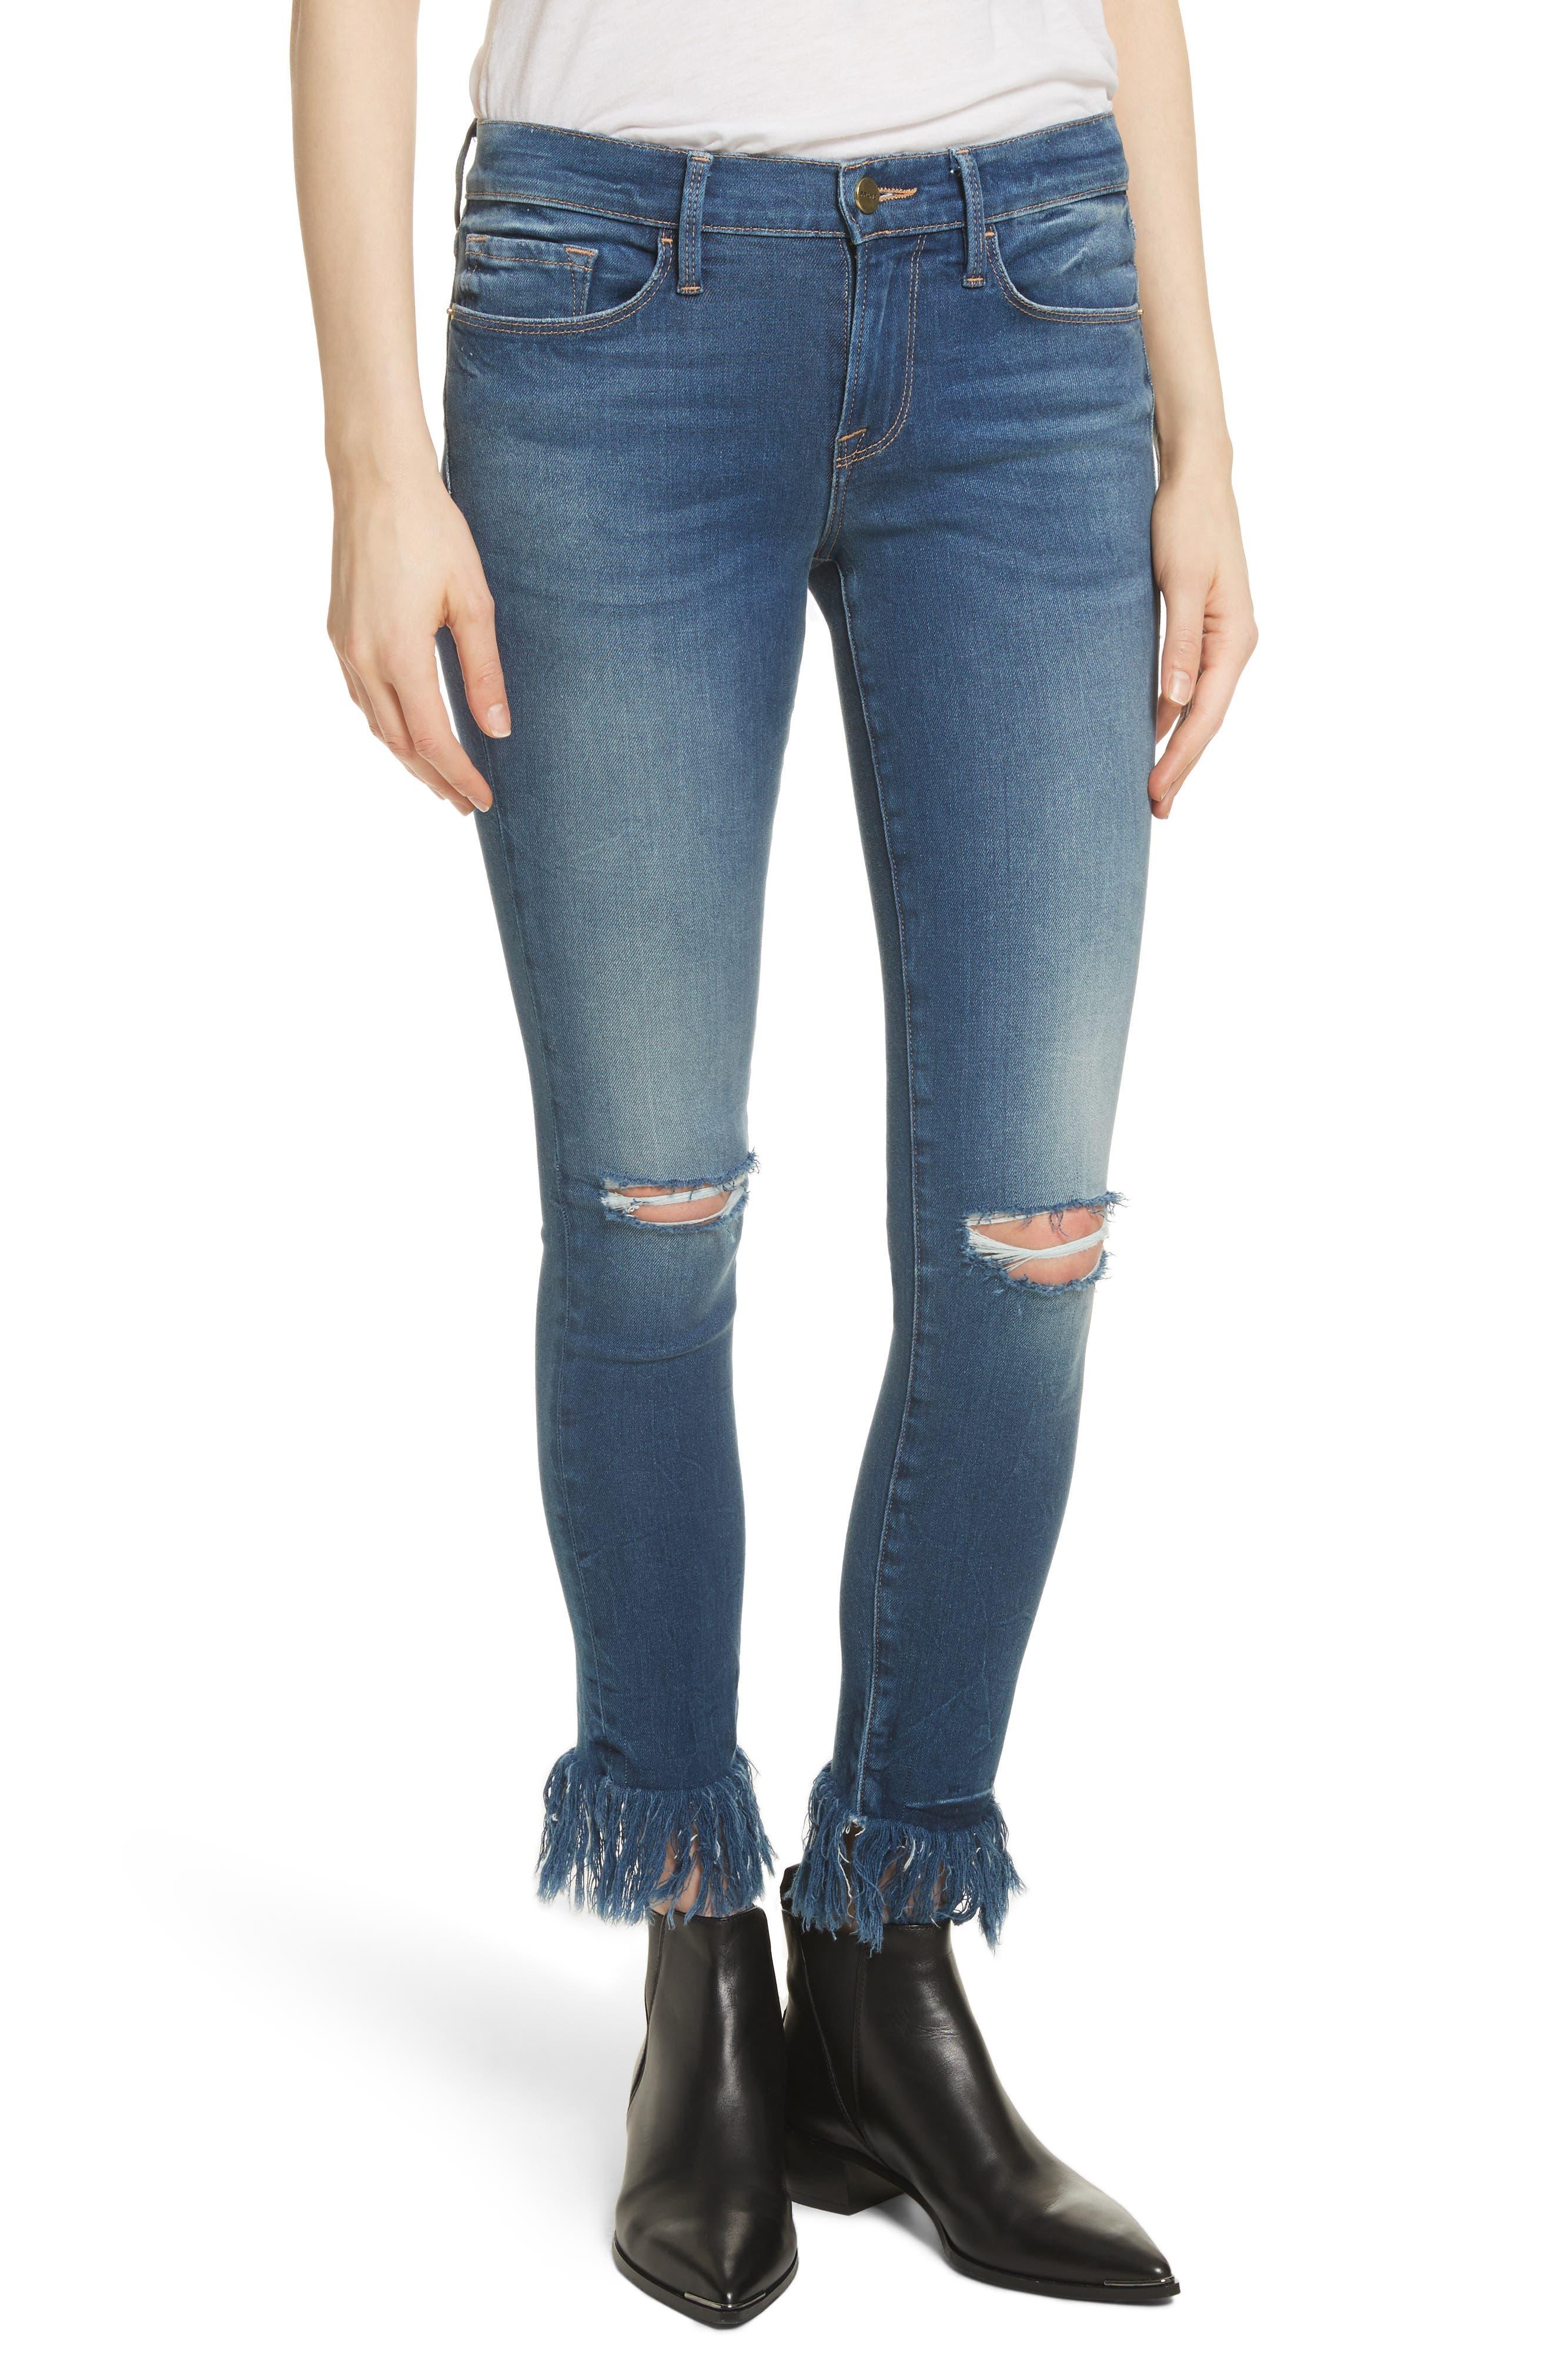 Le Skinny de Jeanne Shredded Raw Hem Jeans,                             Main thumbnail 1, color,                             401